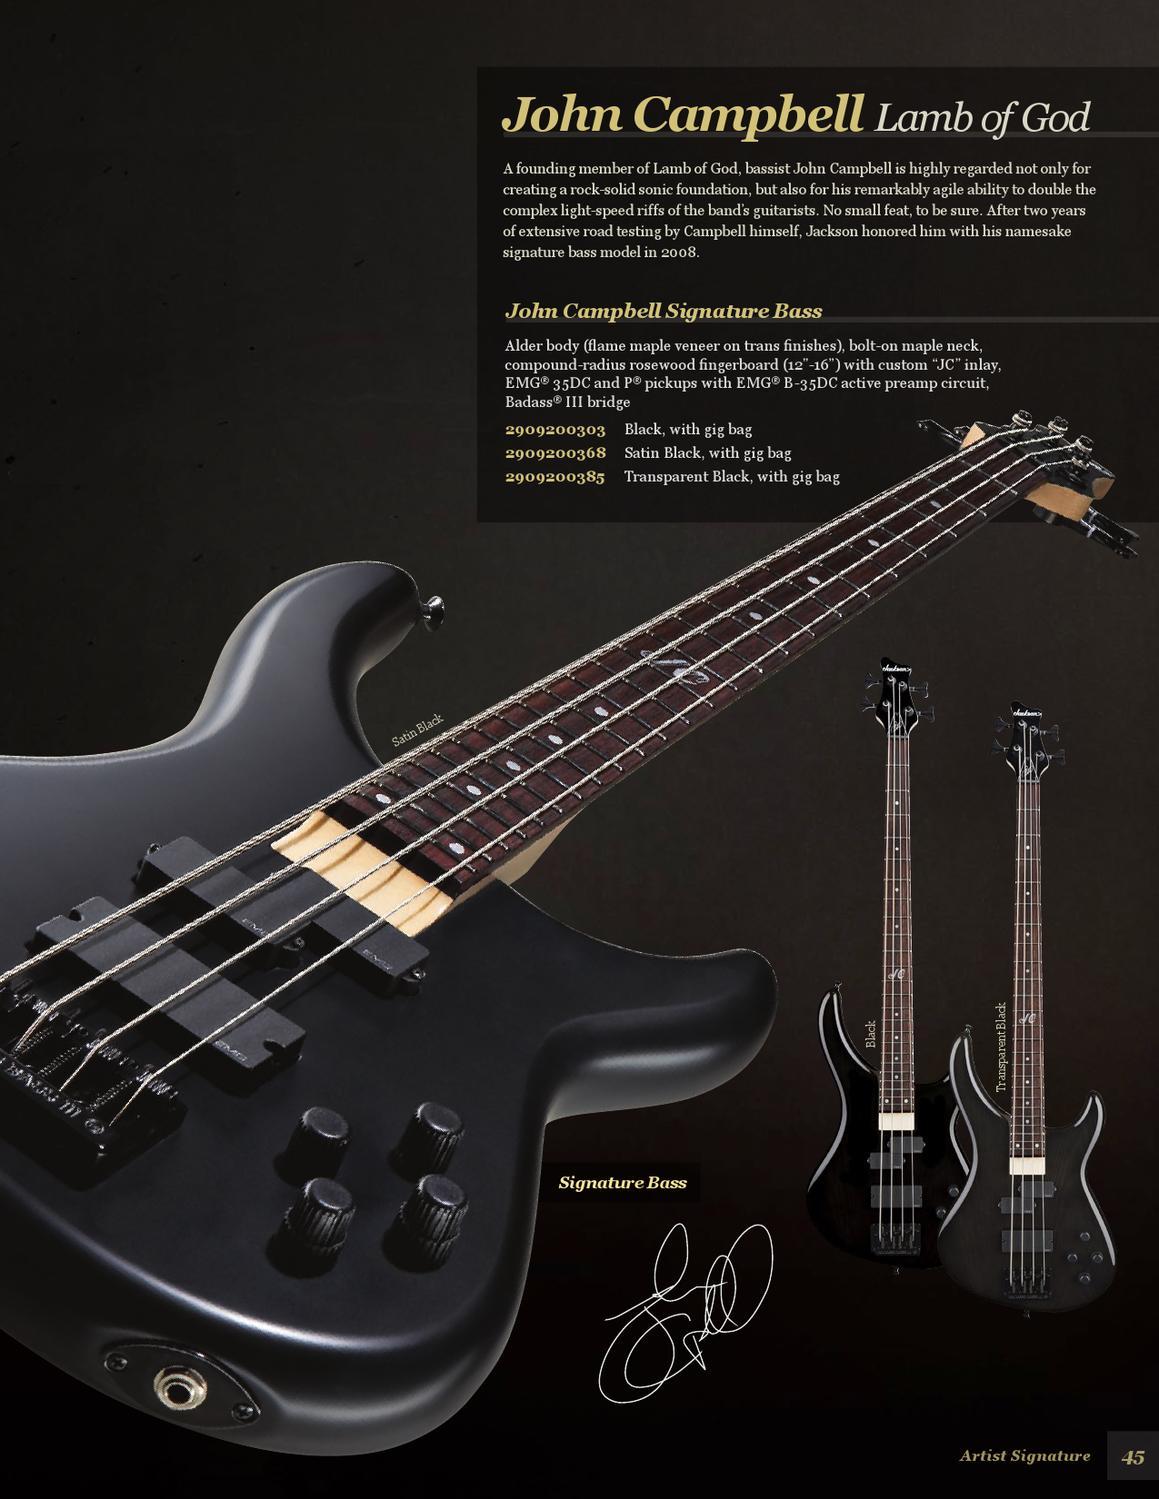 2013 Jackson Guitar Bass Catalog By Guitars Issuu With Emg Pickup Wiring